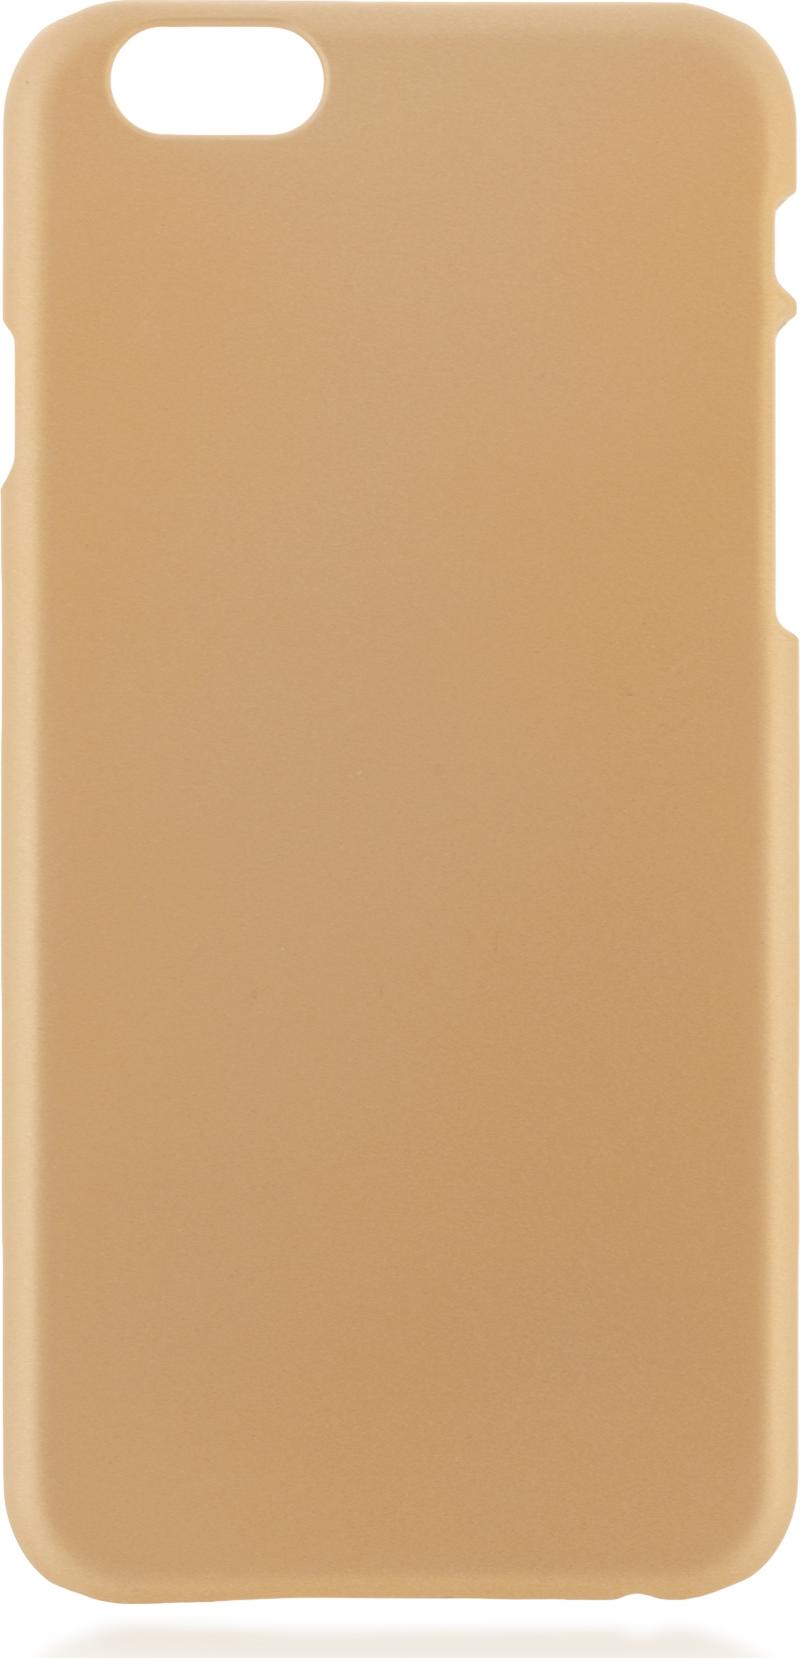 Чехол Brosco Soft-Touch для Apple iPhone 6, шампань original new innolux 5 6 inch at056tn53 v 1 lcd screen with touch